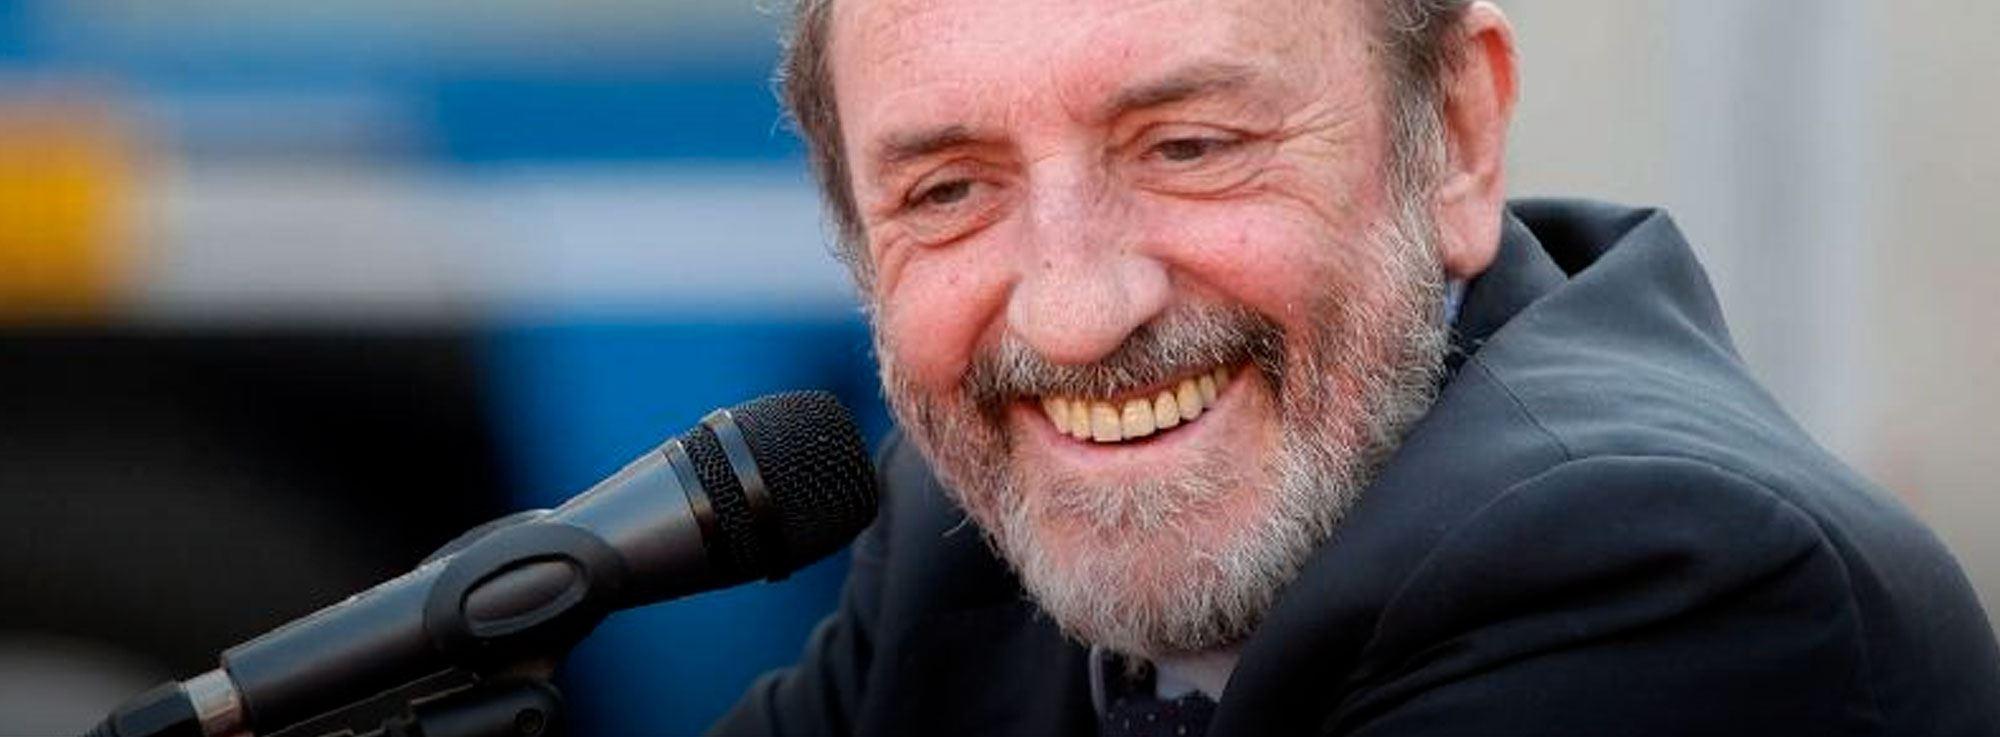 Taviano: La parola ai giovani - Umberto Galimberti